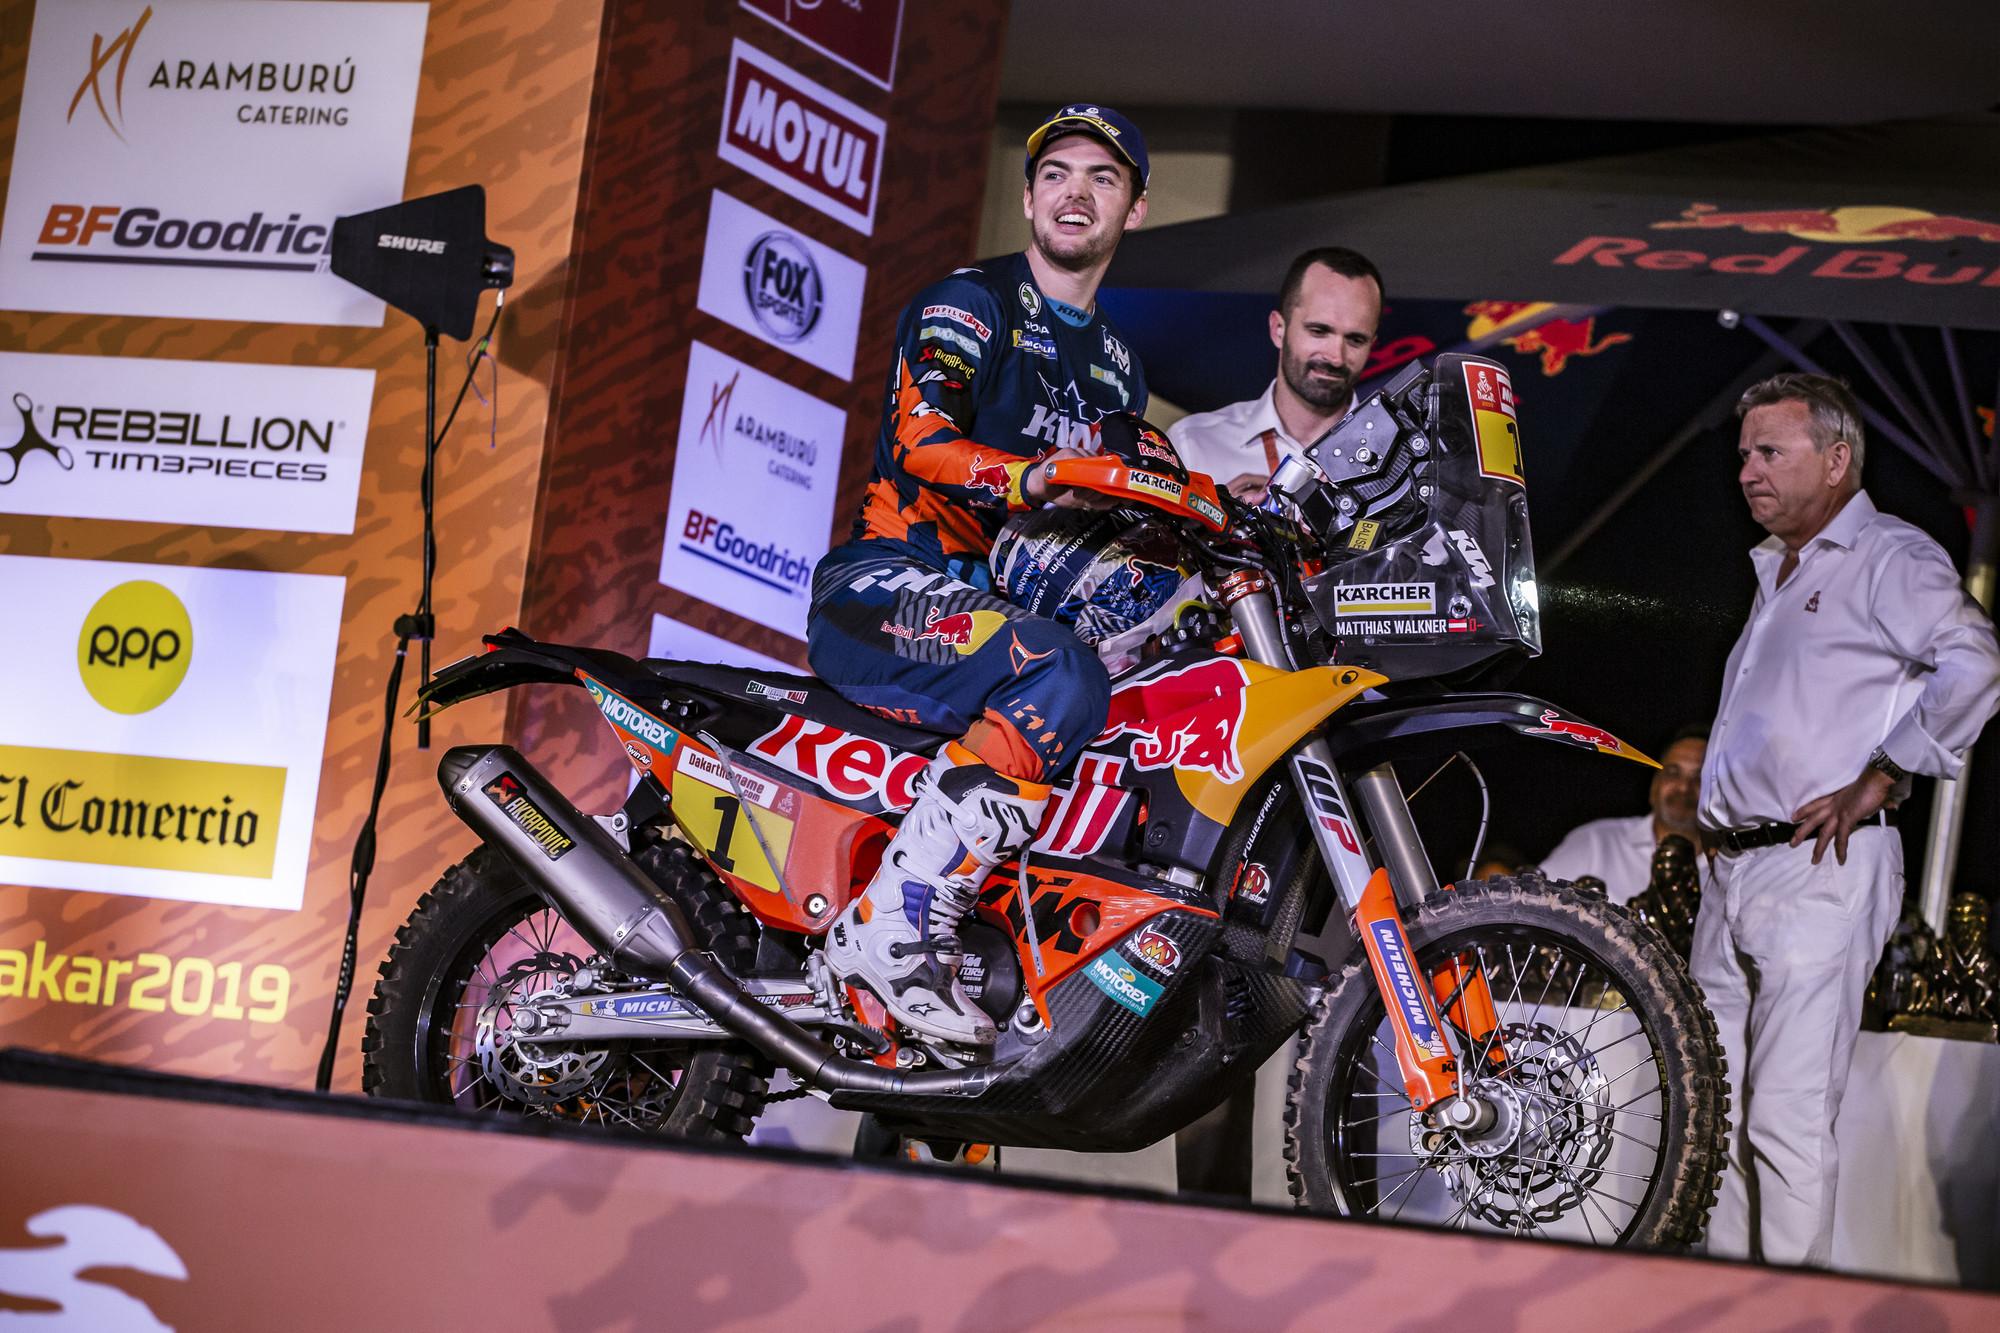 263403_matthias.walkner_finish_Red Bull KTM Factory Racing_Dakar2019_496.jpg